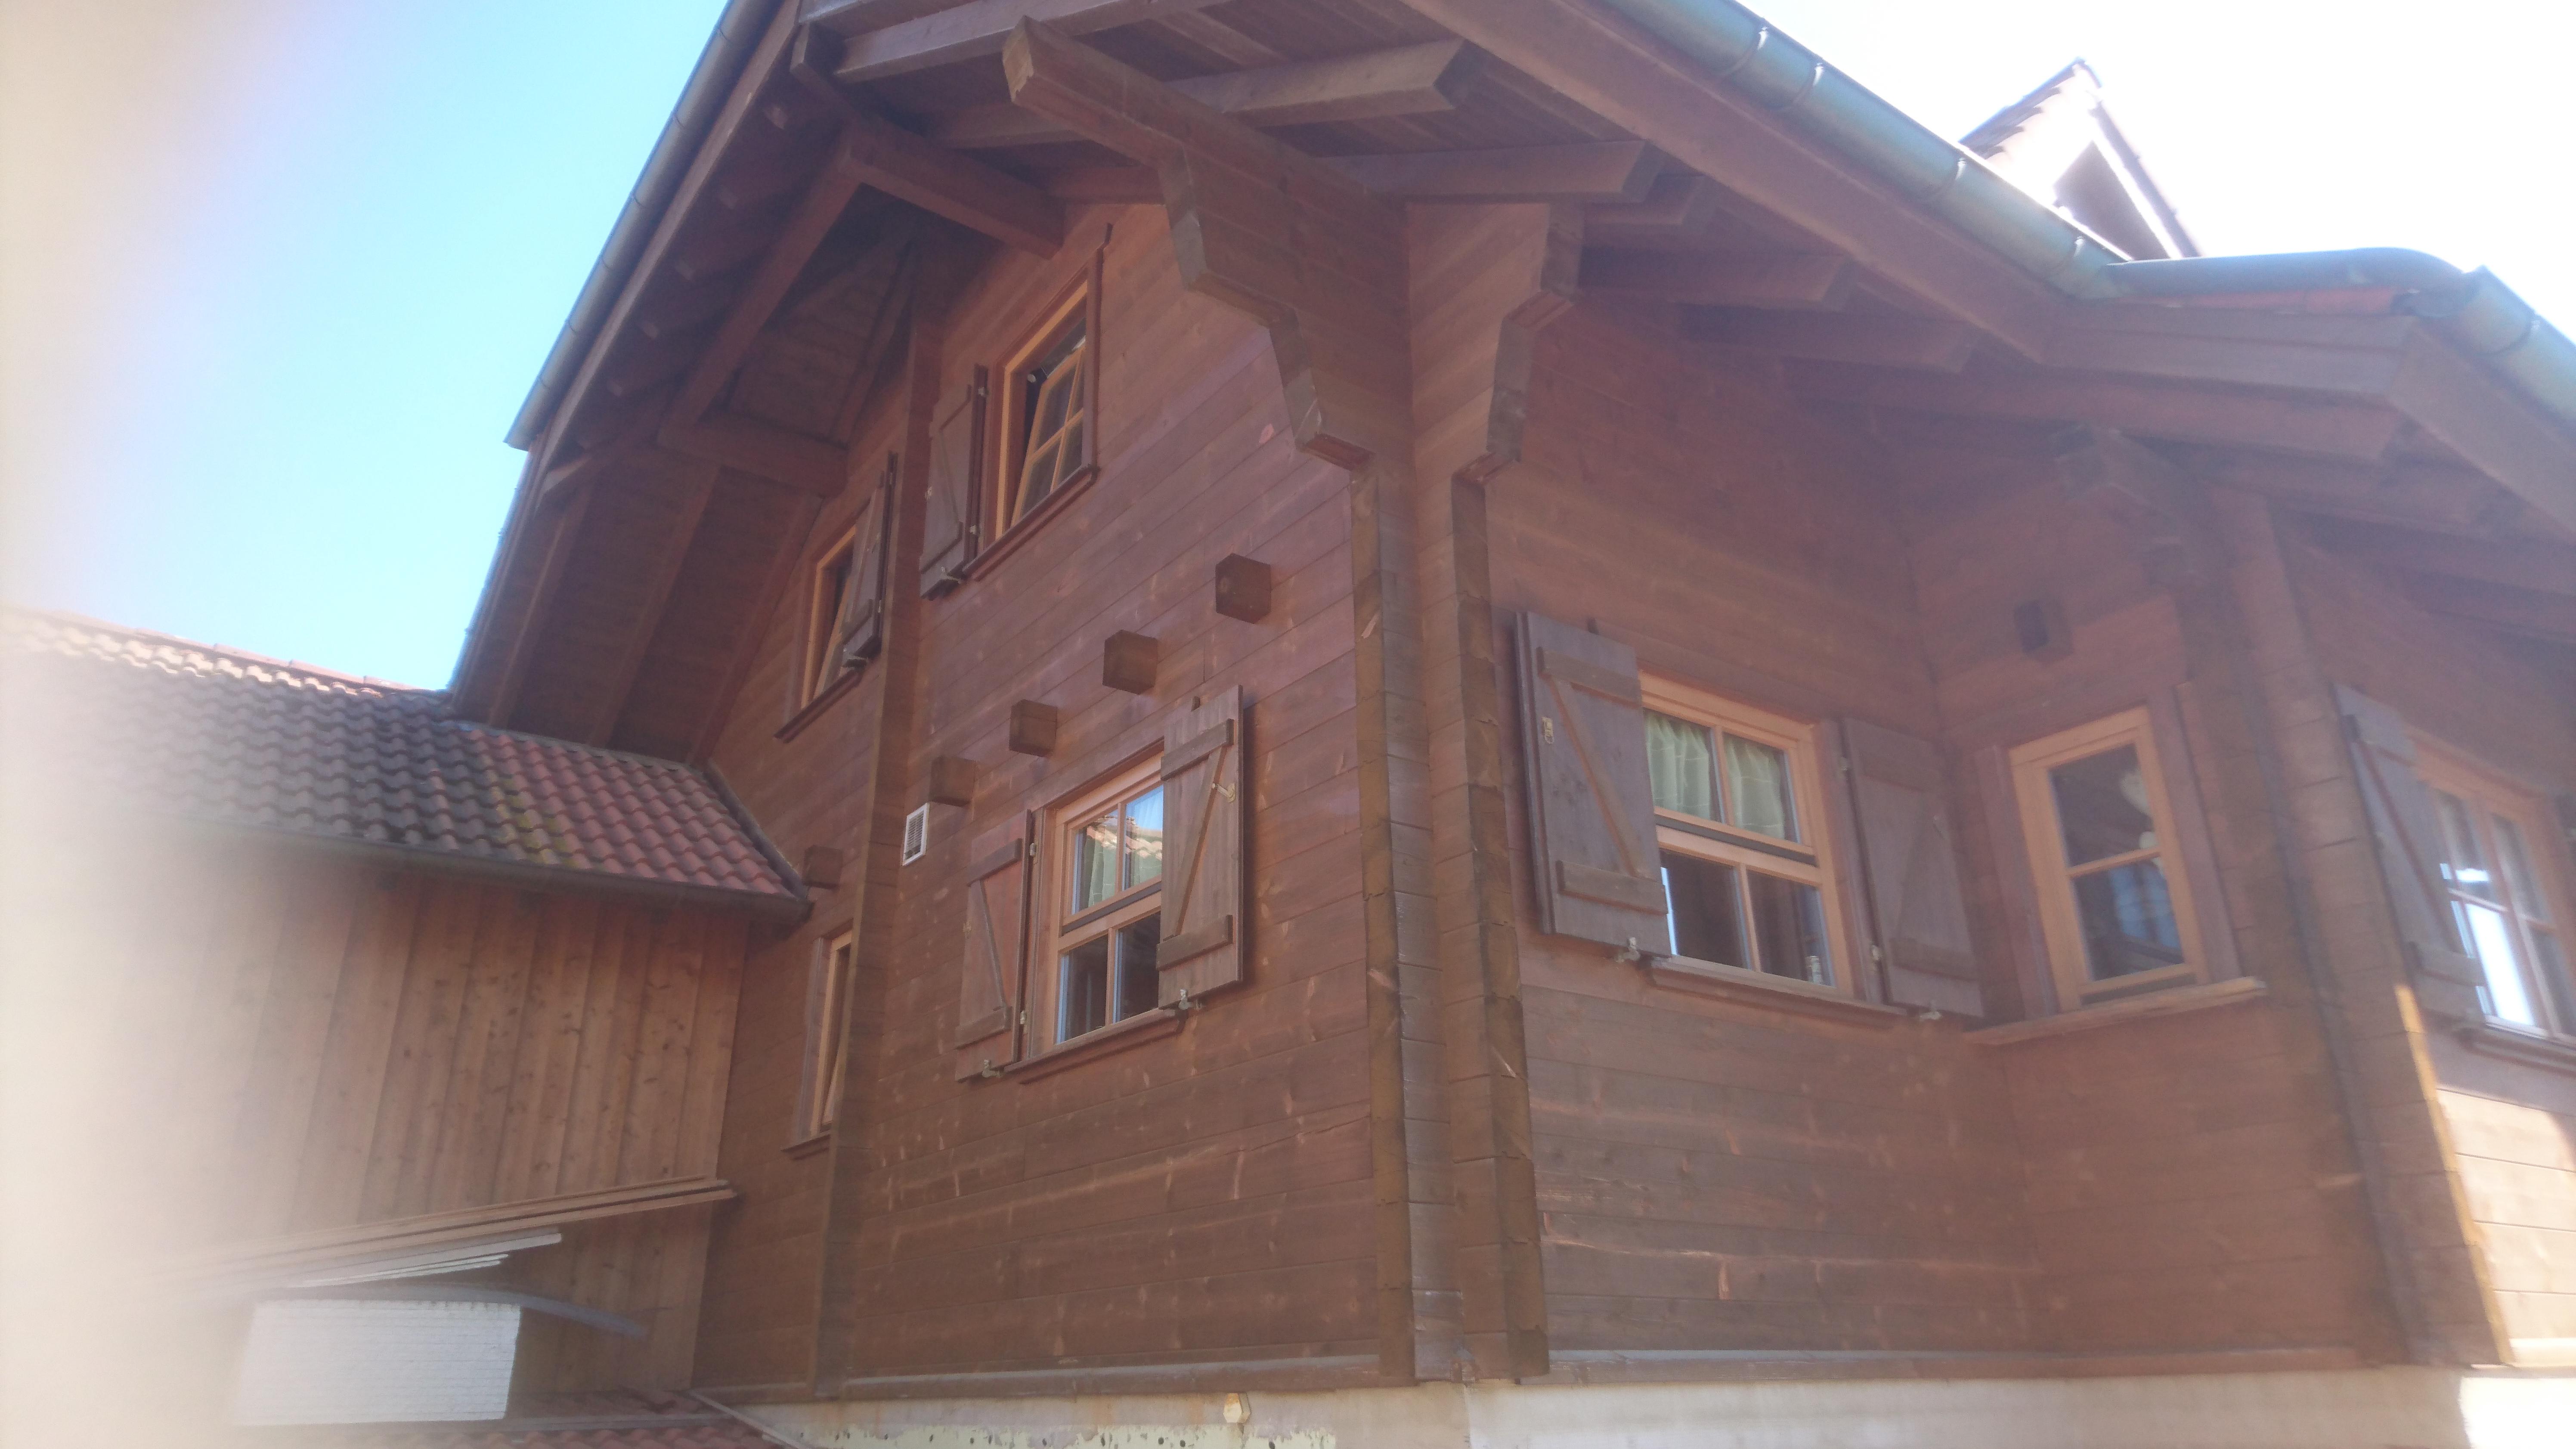 Holzhaus Holzlasur entfernen